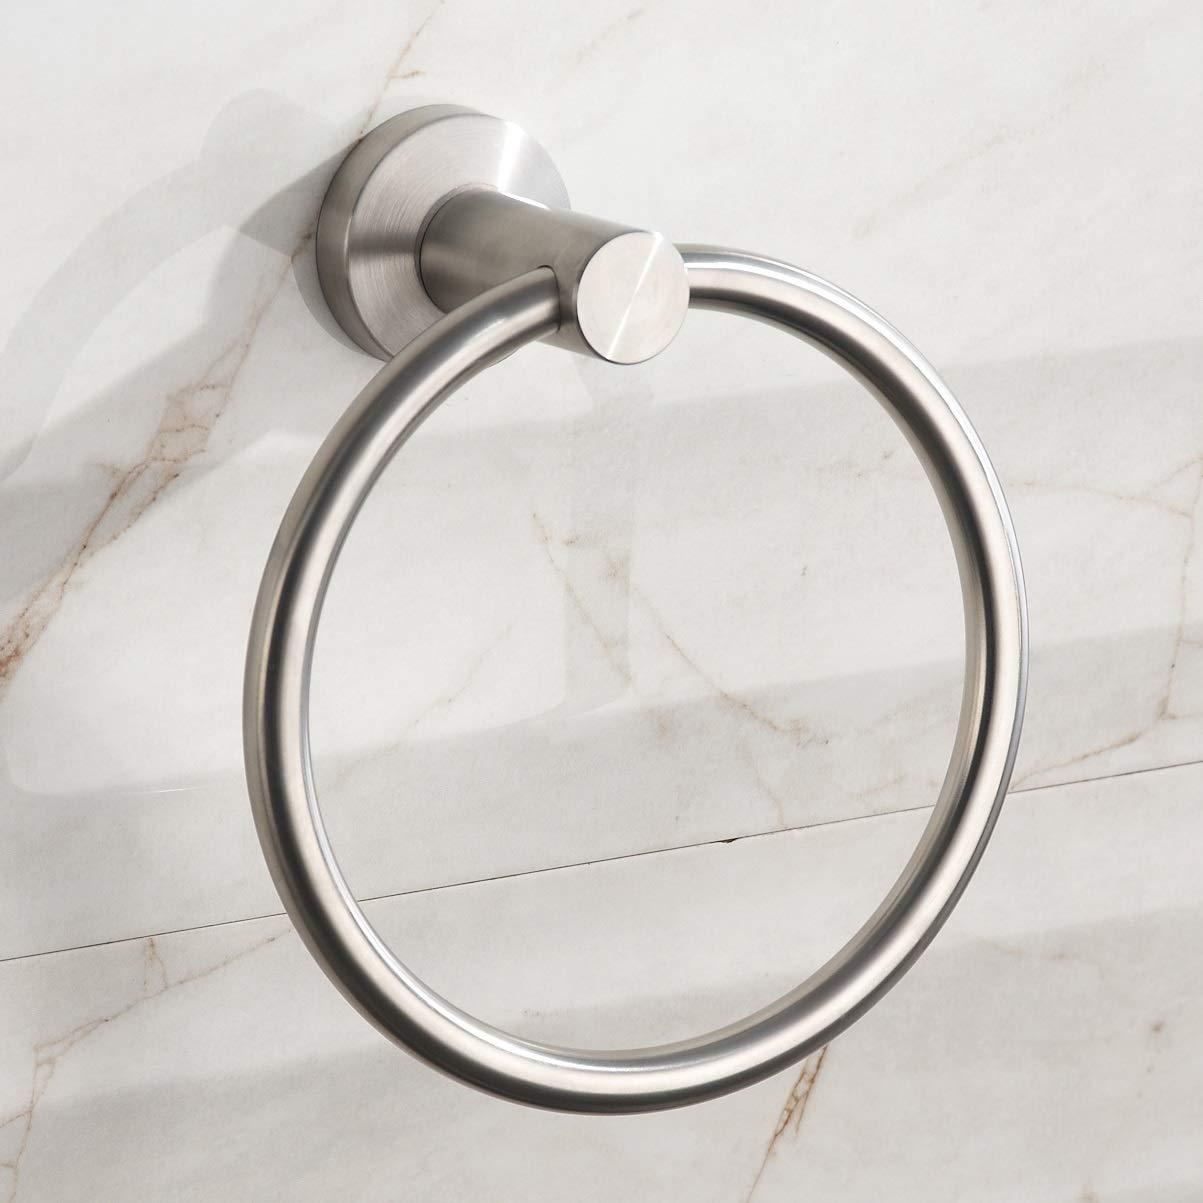 Nail Free No Drilling Adhesive Bathroom Kitchen Towel Ring Holder Round #3